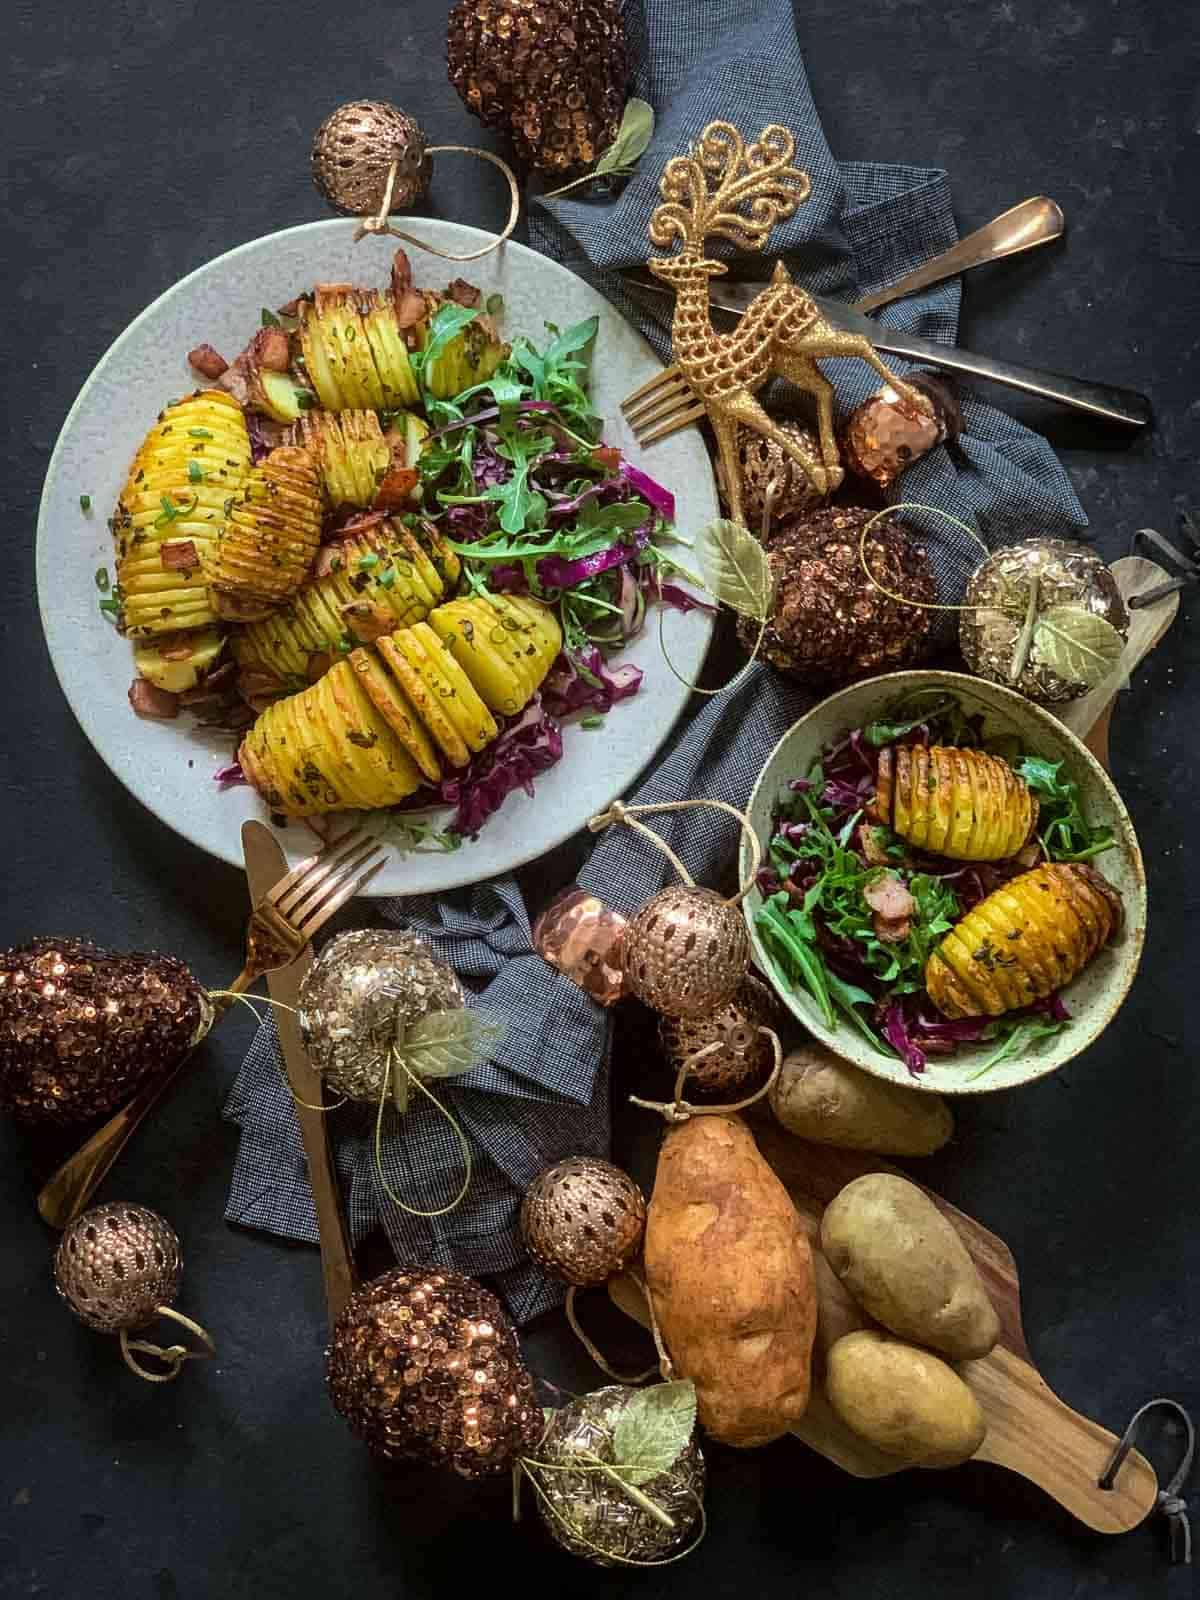 Christmas Salad with Roasted Potatoes, Bacon & Arugula